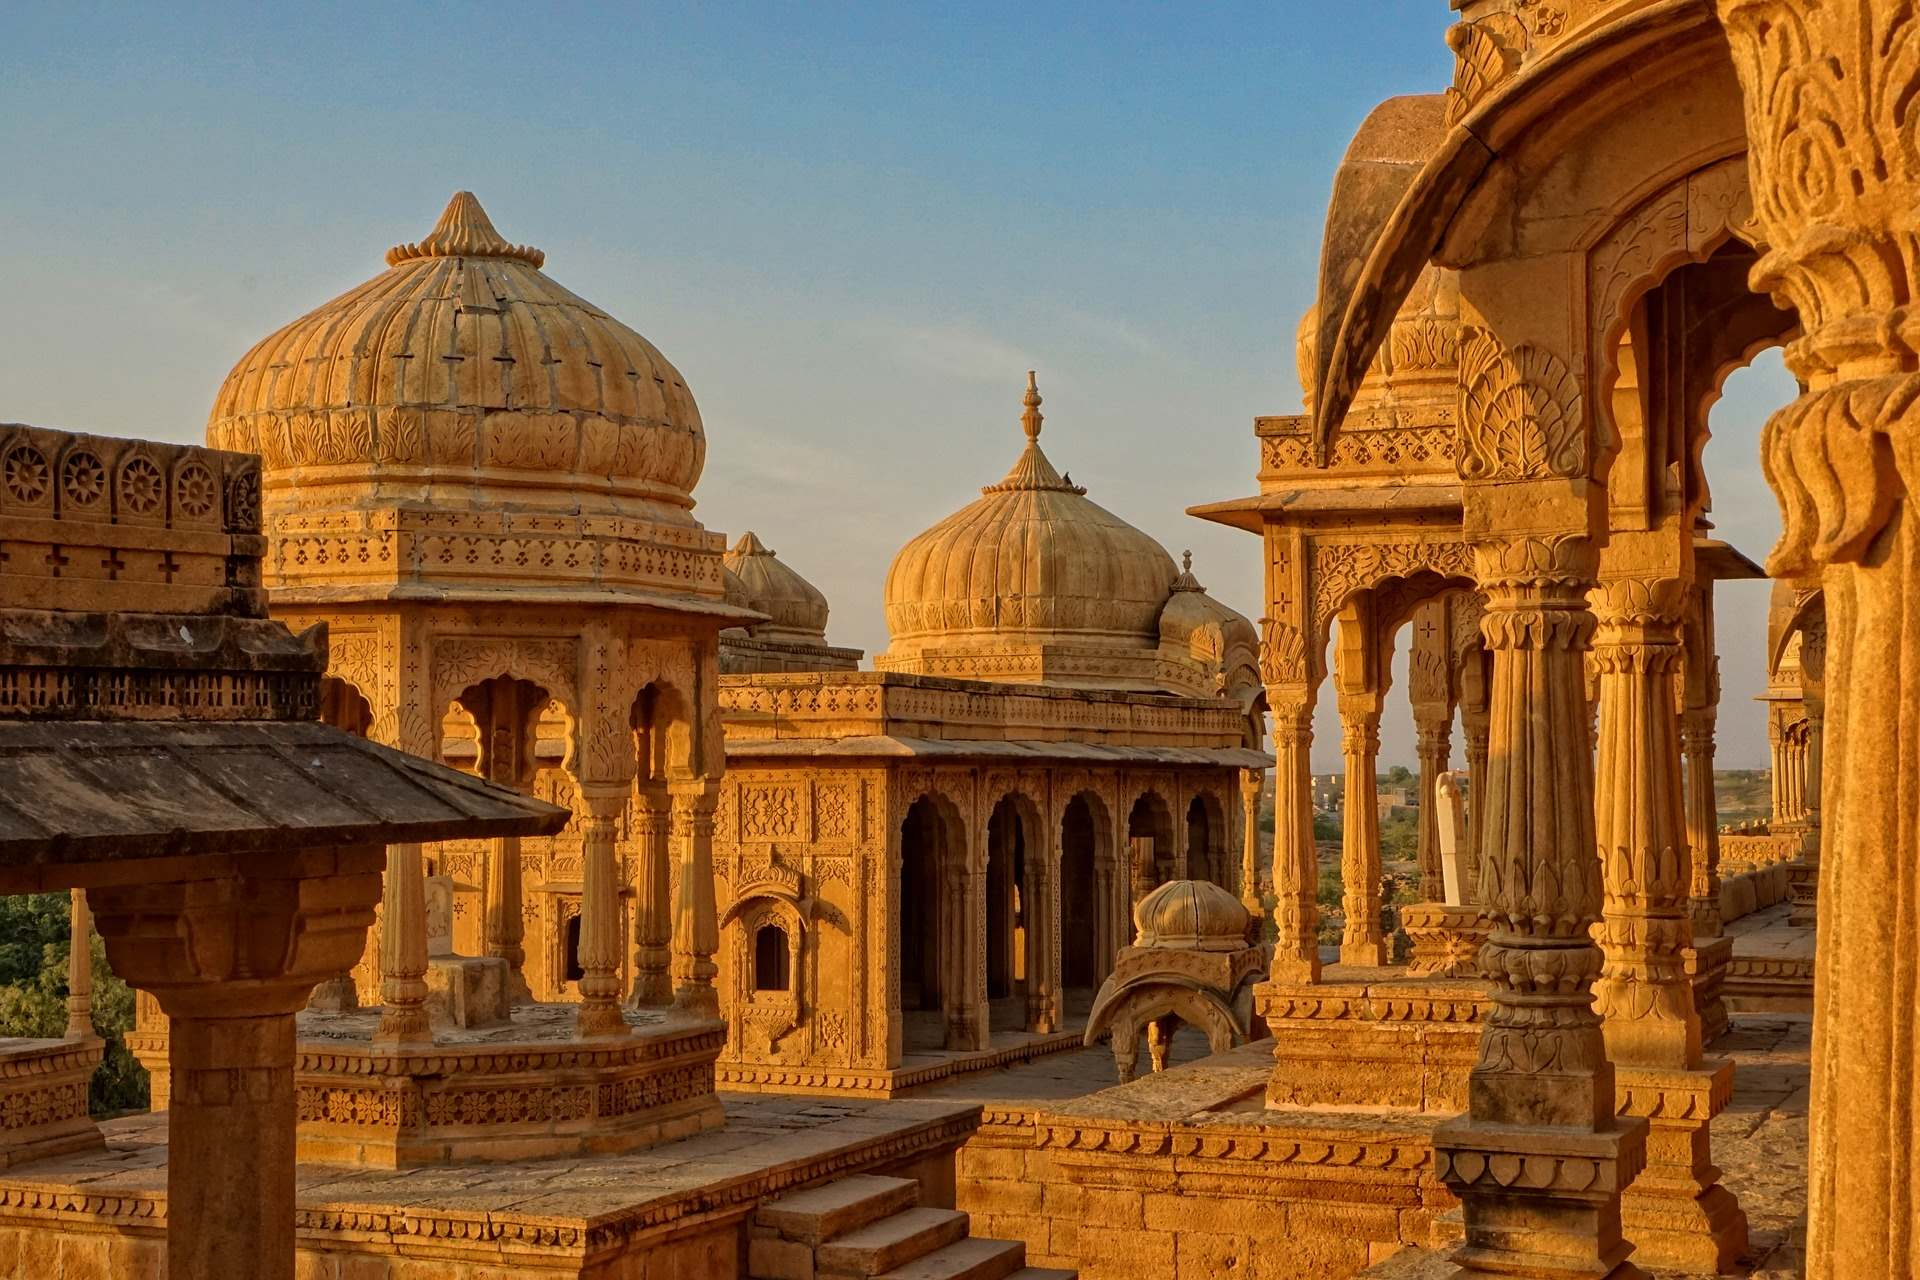 Honeymoon Destinations in India - Jaisalmer